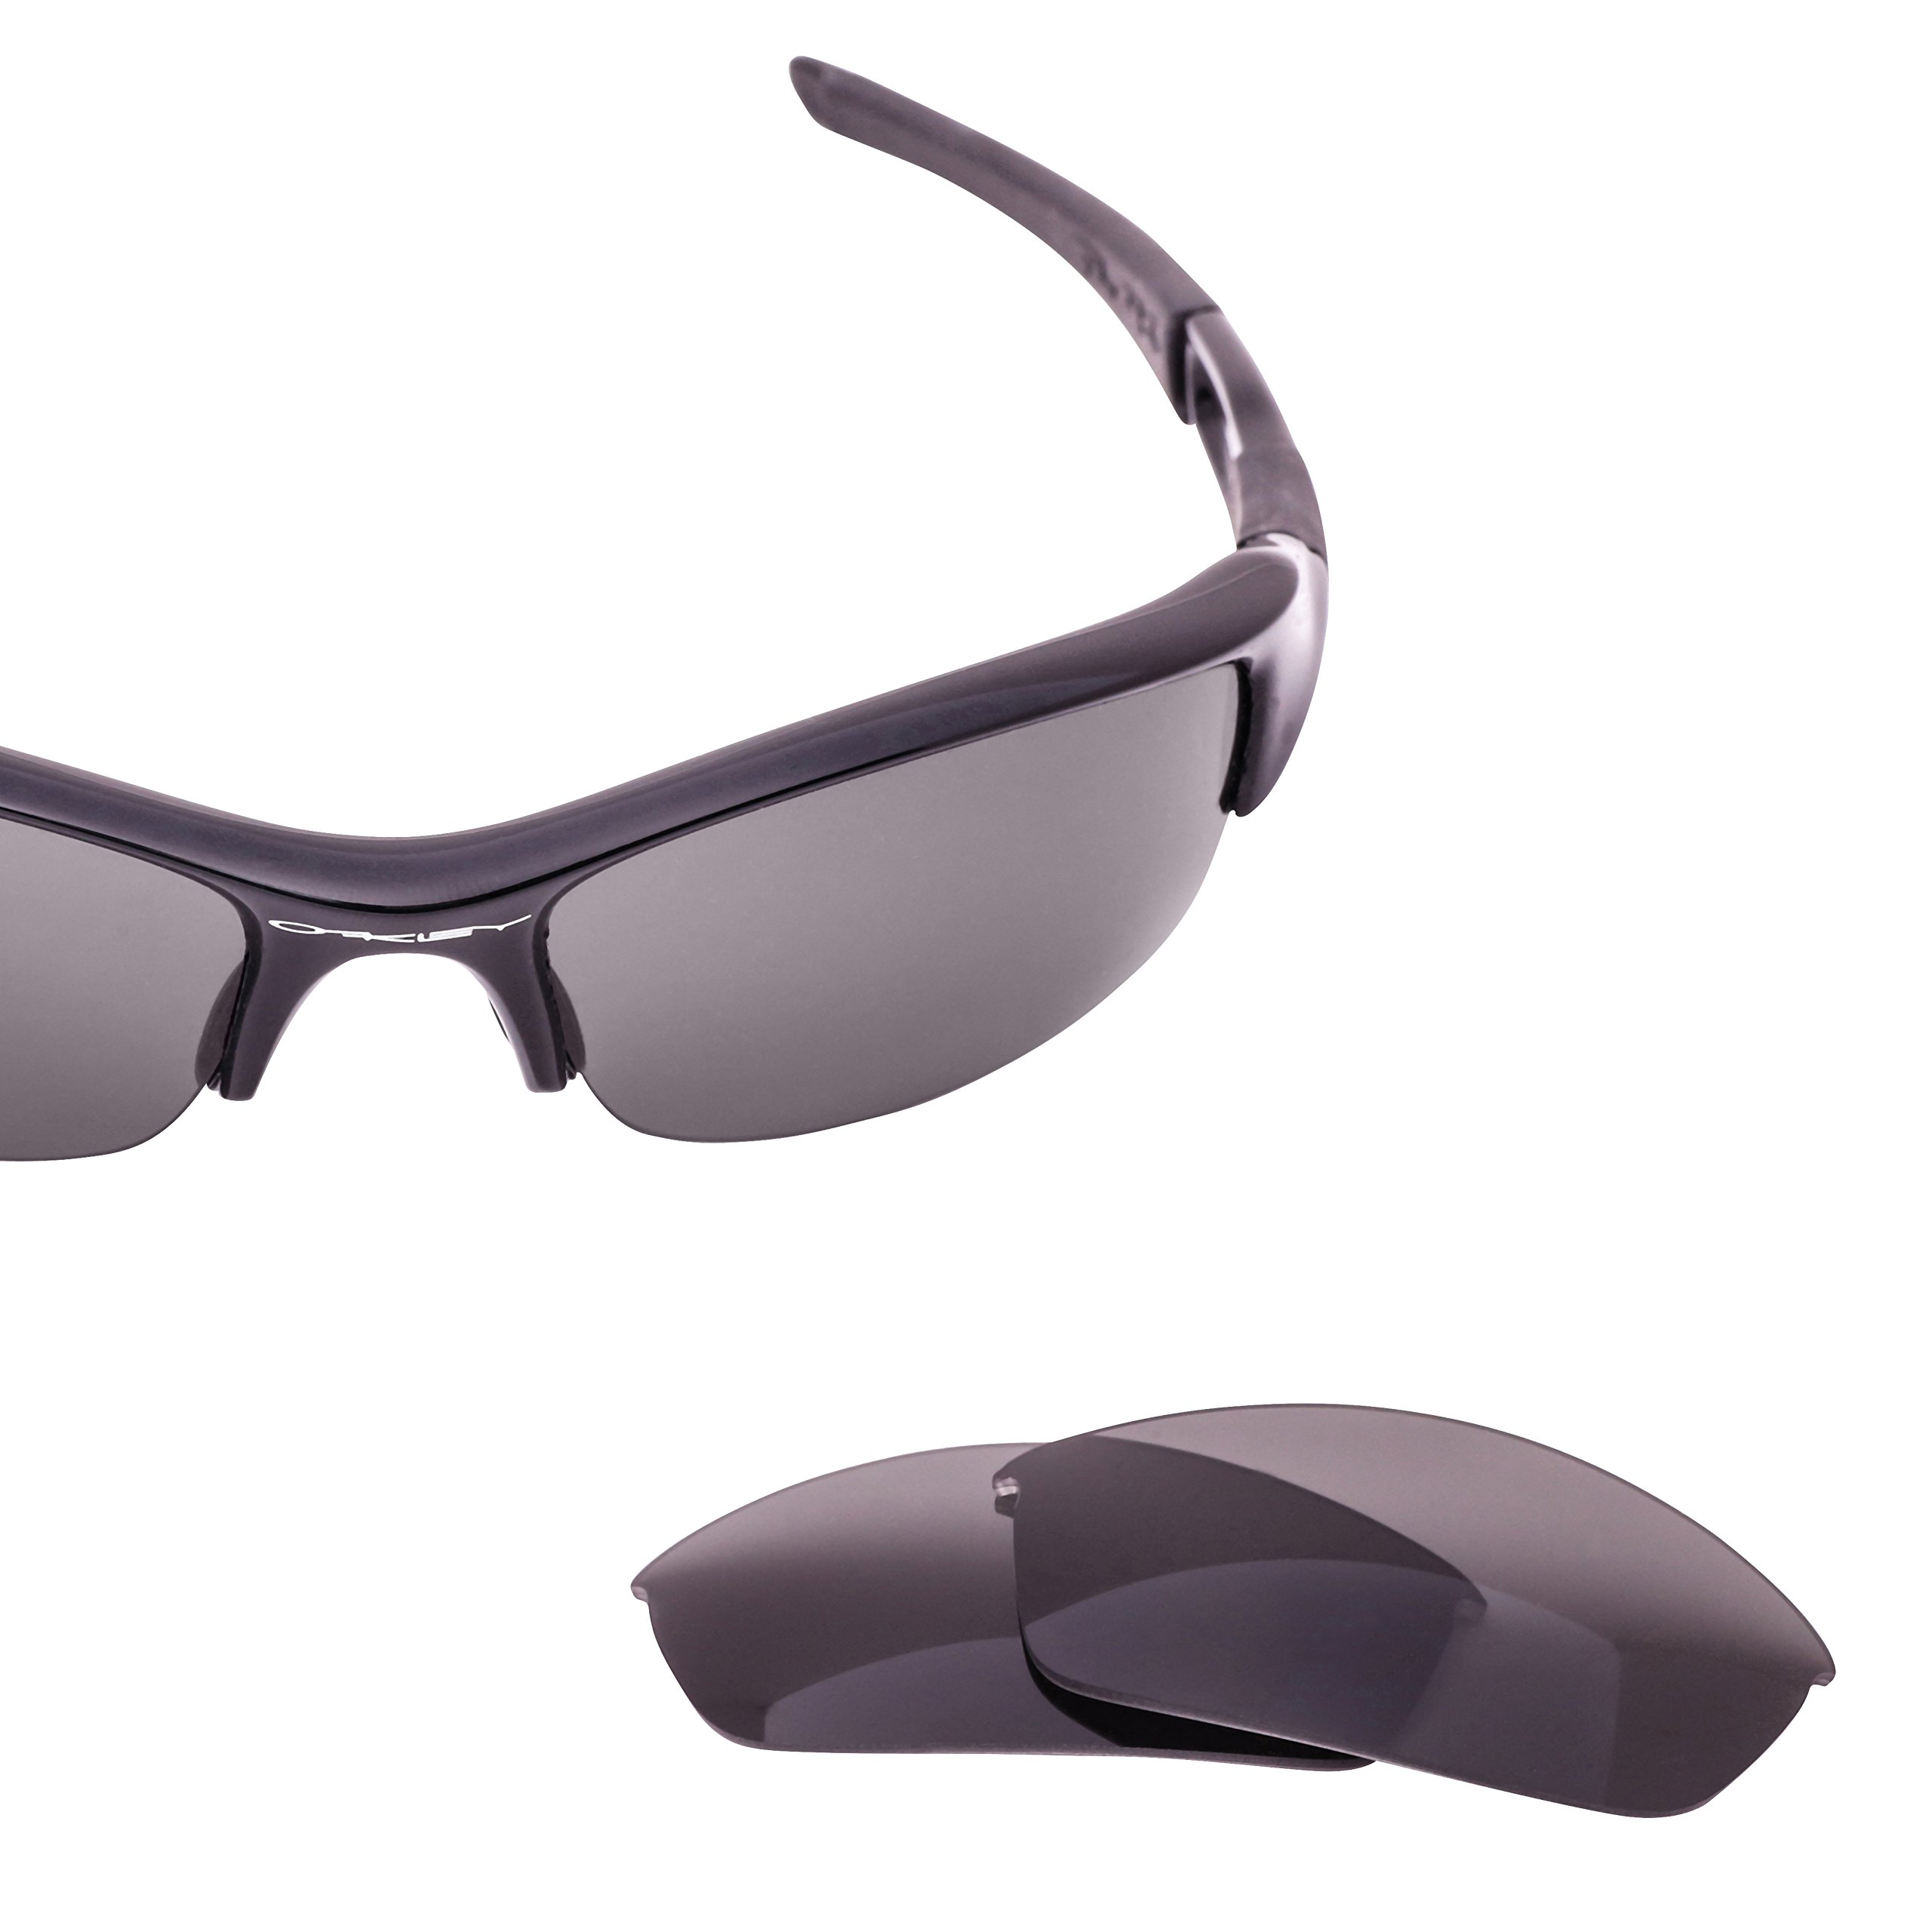 LenzFlip Replacement Lenses for Oakley FLAK JACKET Sunglass- Black Polarized Lenses